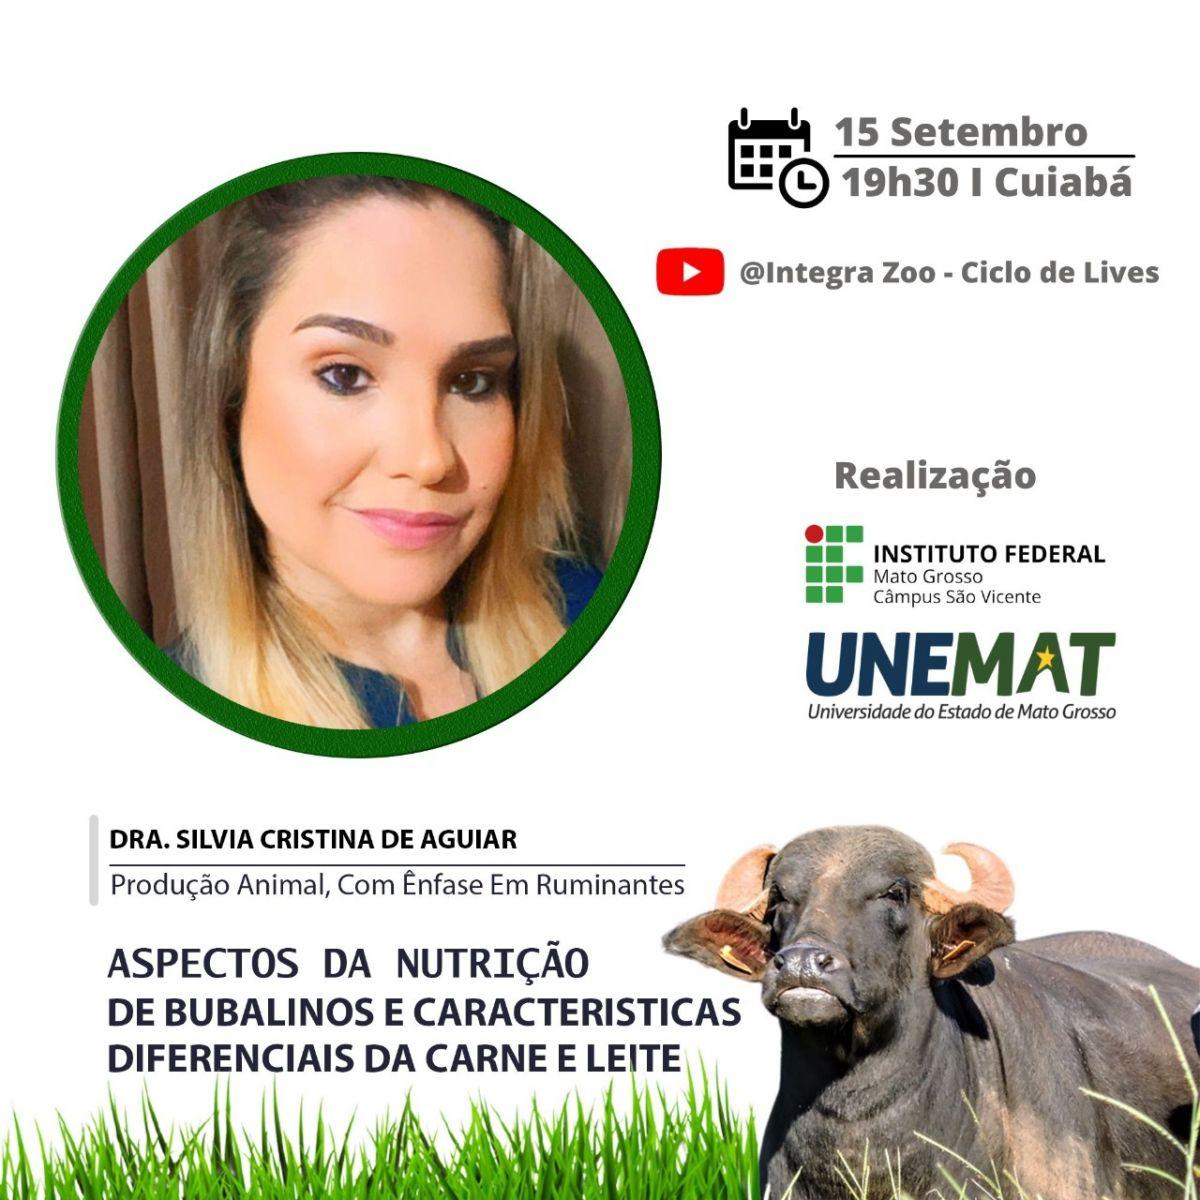 Integra Zoo - Ciclo de Lives